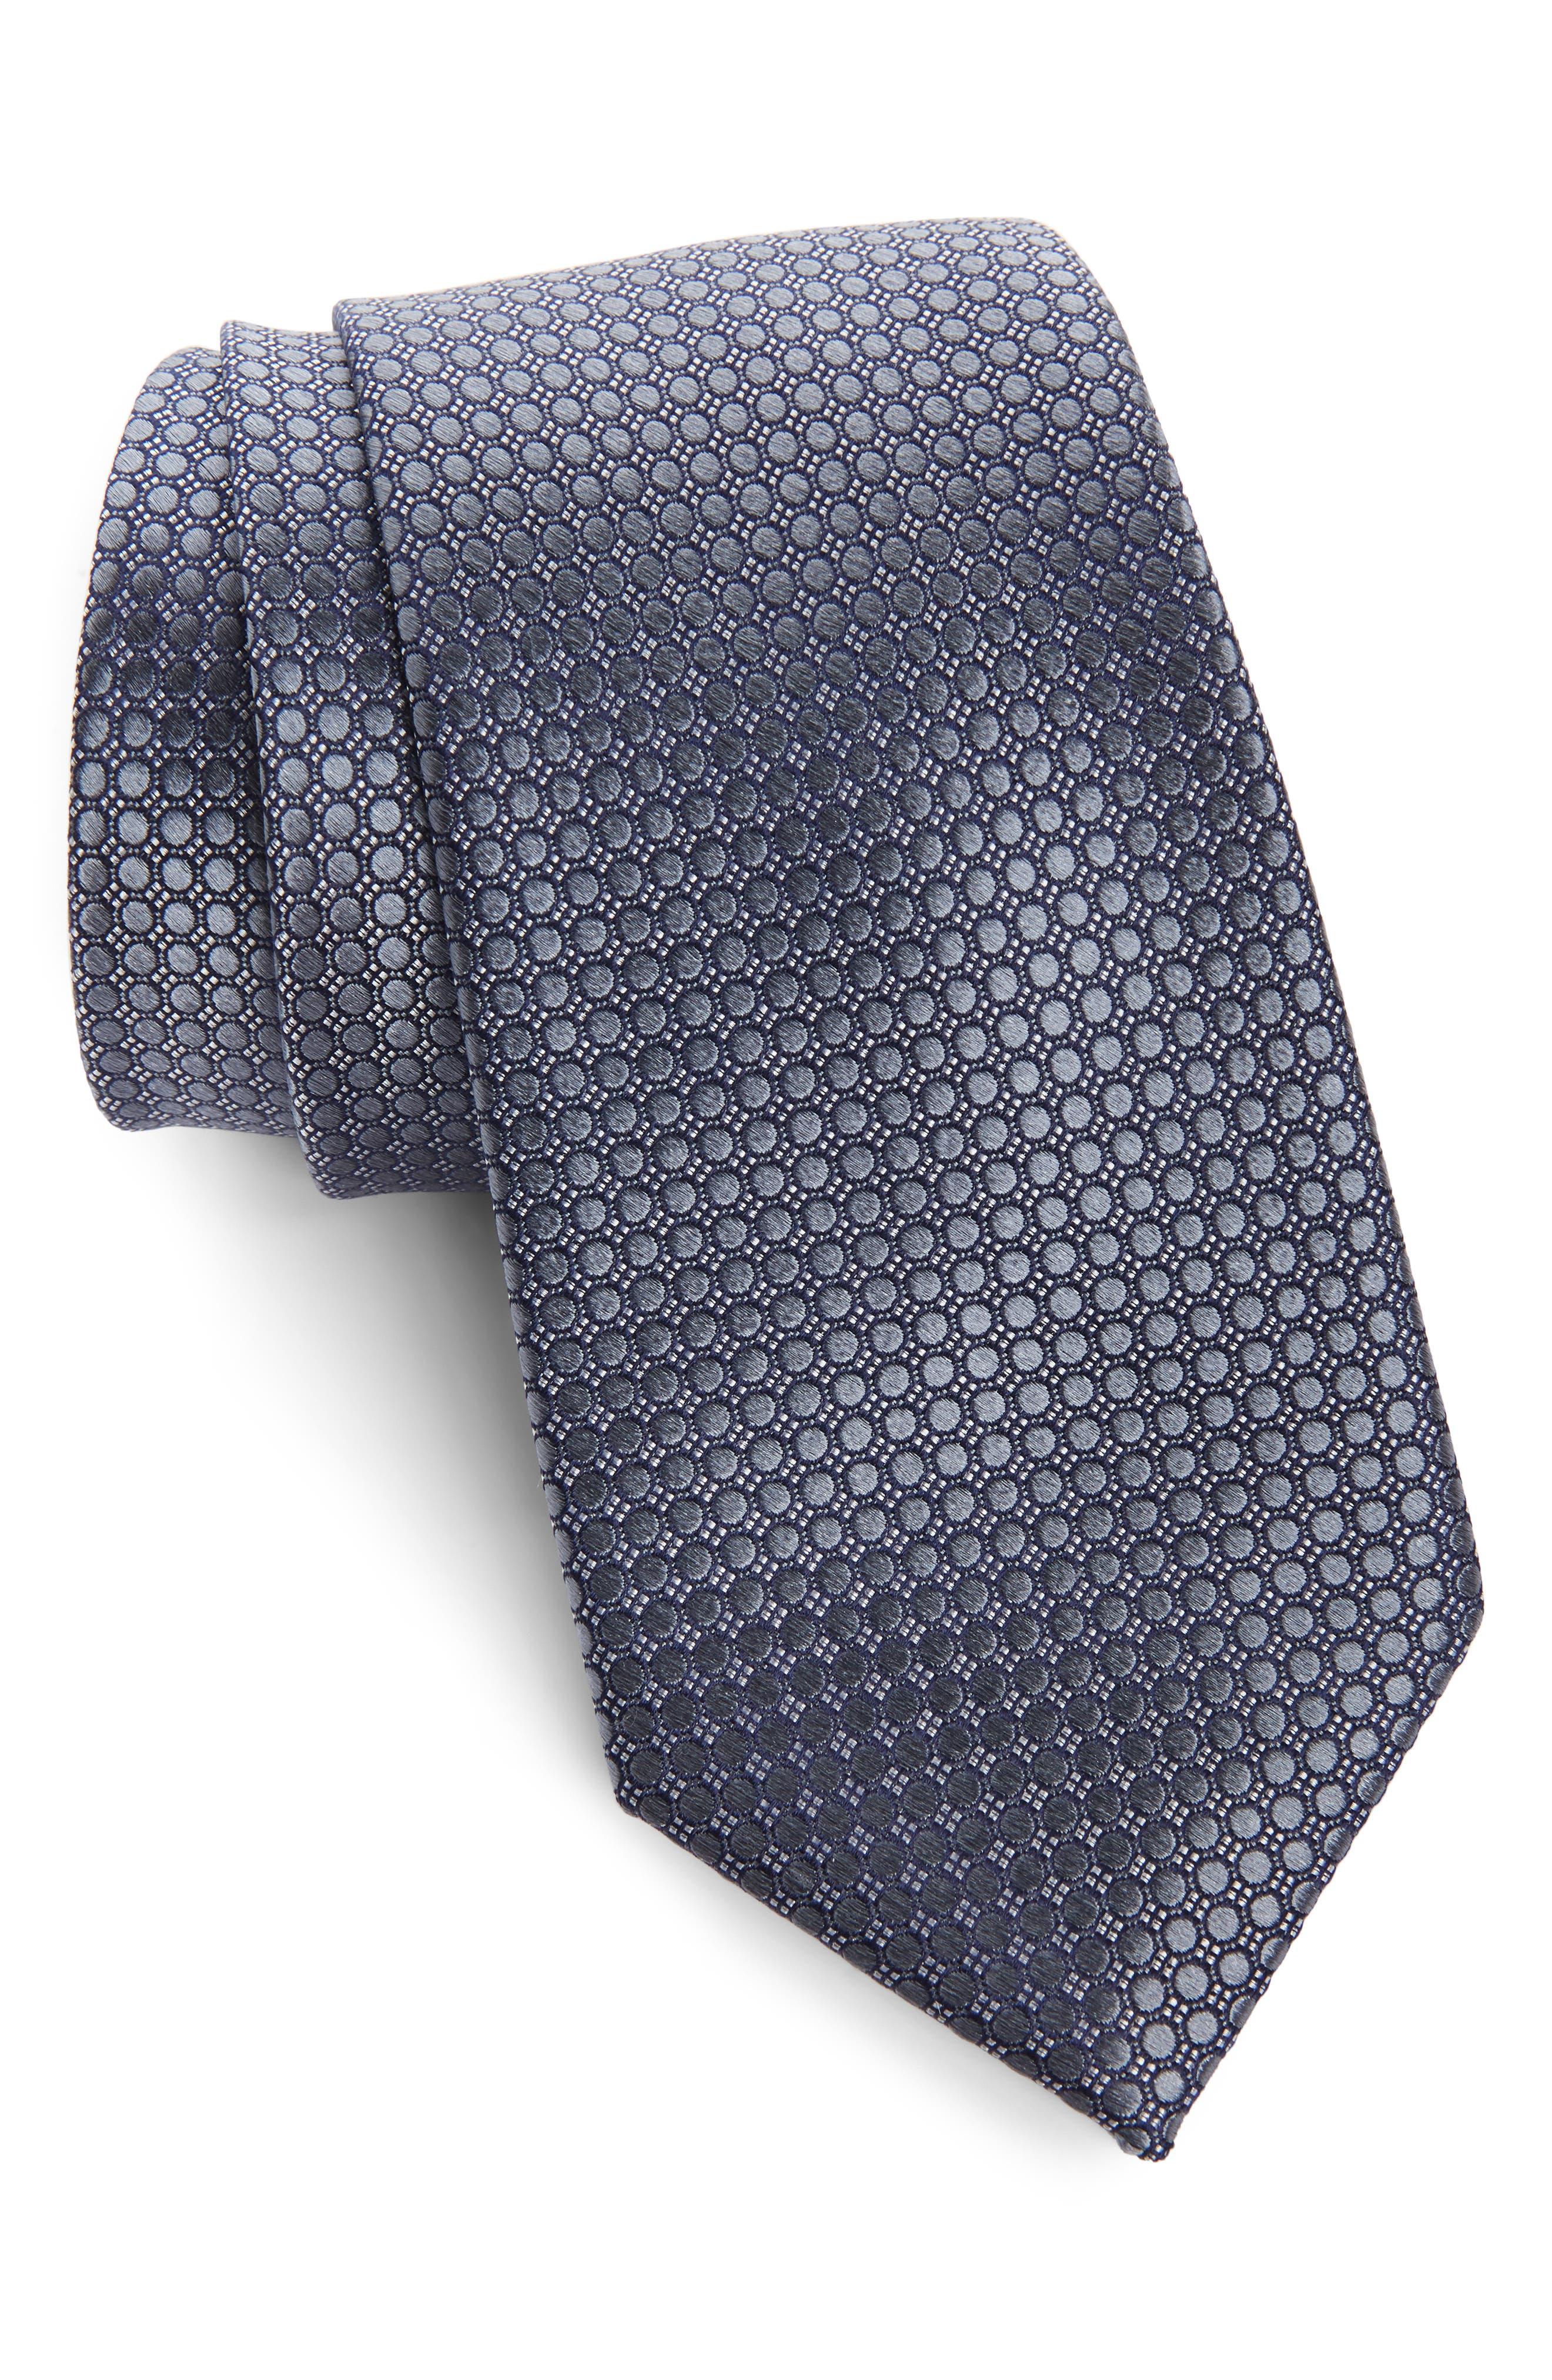 NORDSTROM MEN'S SHOP,                             Alana Geometric Silk Tie,                             Main thumbnail 1, color,                             BLACK/ GREY